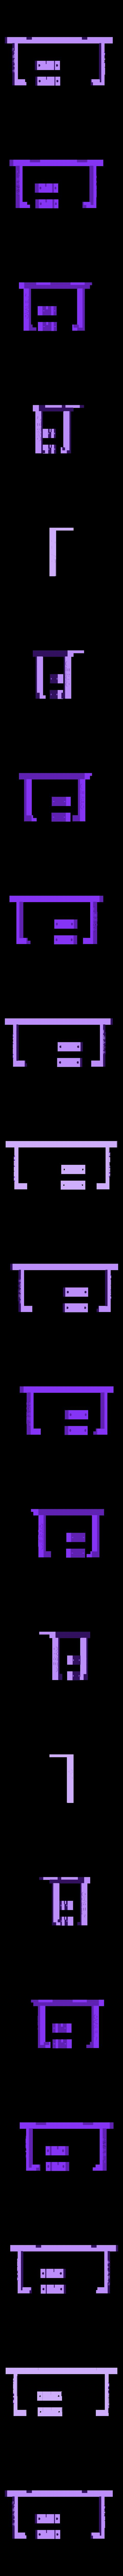 support avec rail.stl Download free STL file Jebao dosing pump support • 3D printable design, lorenzo61183